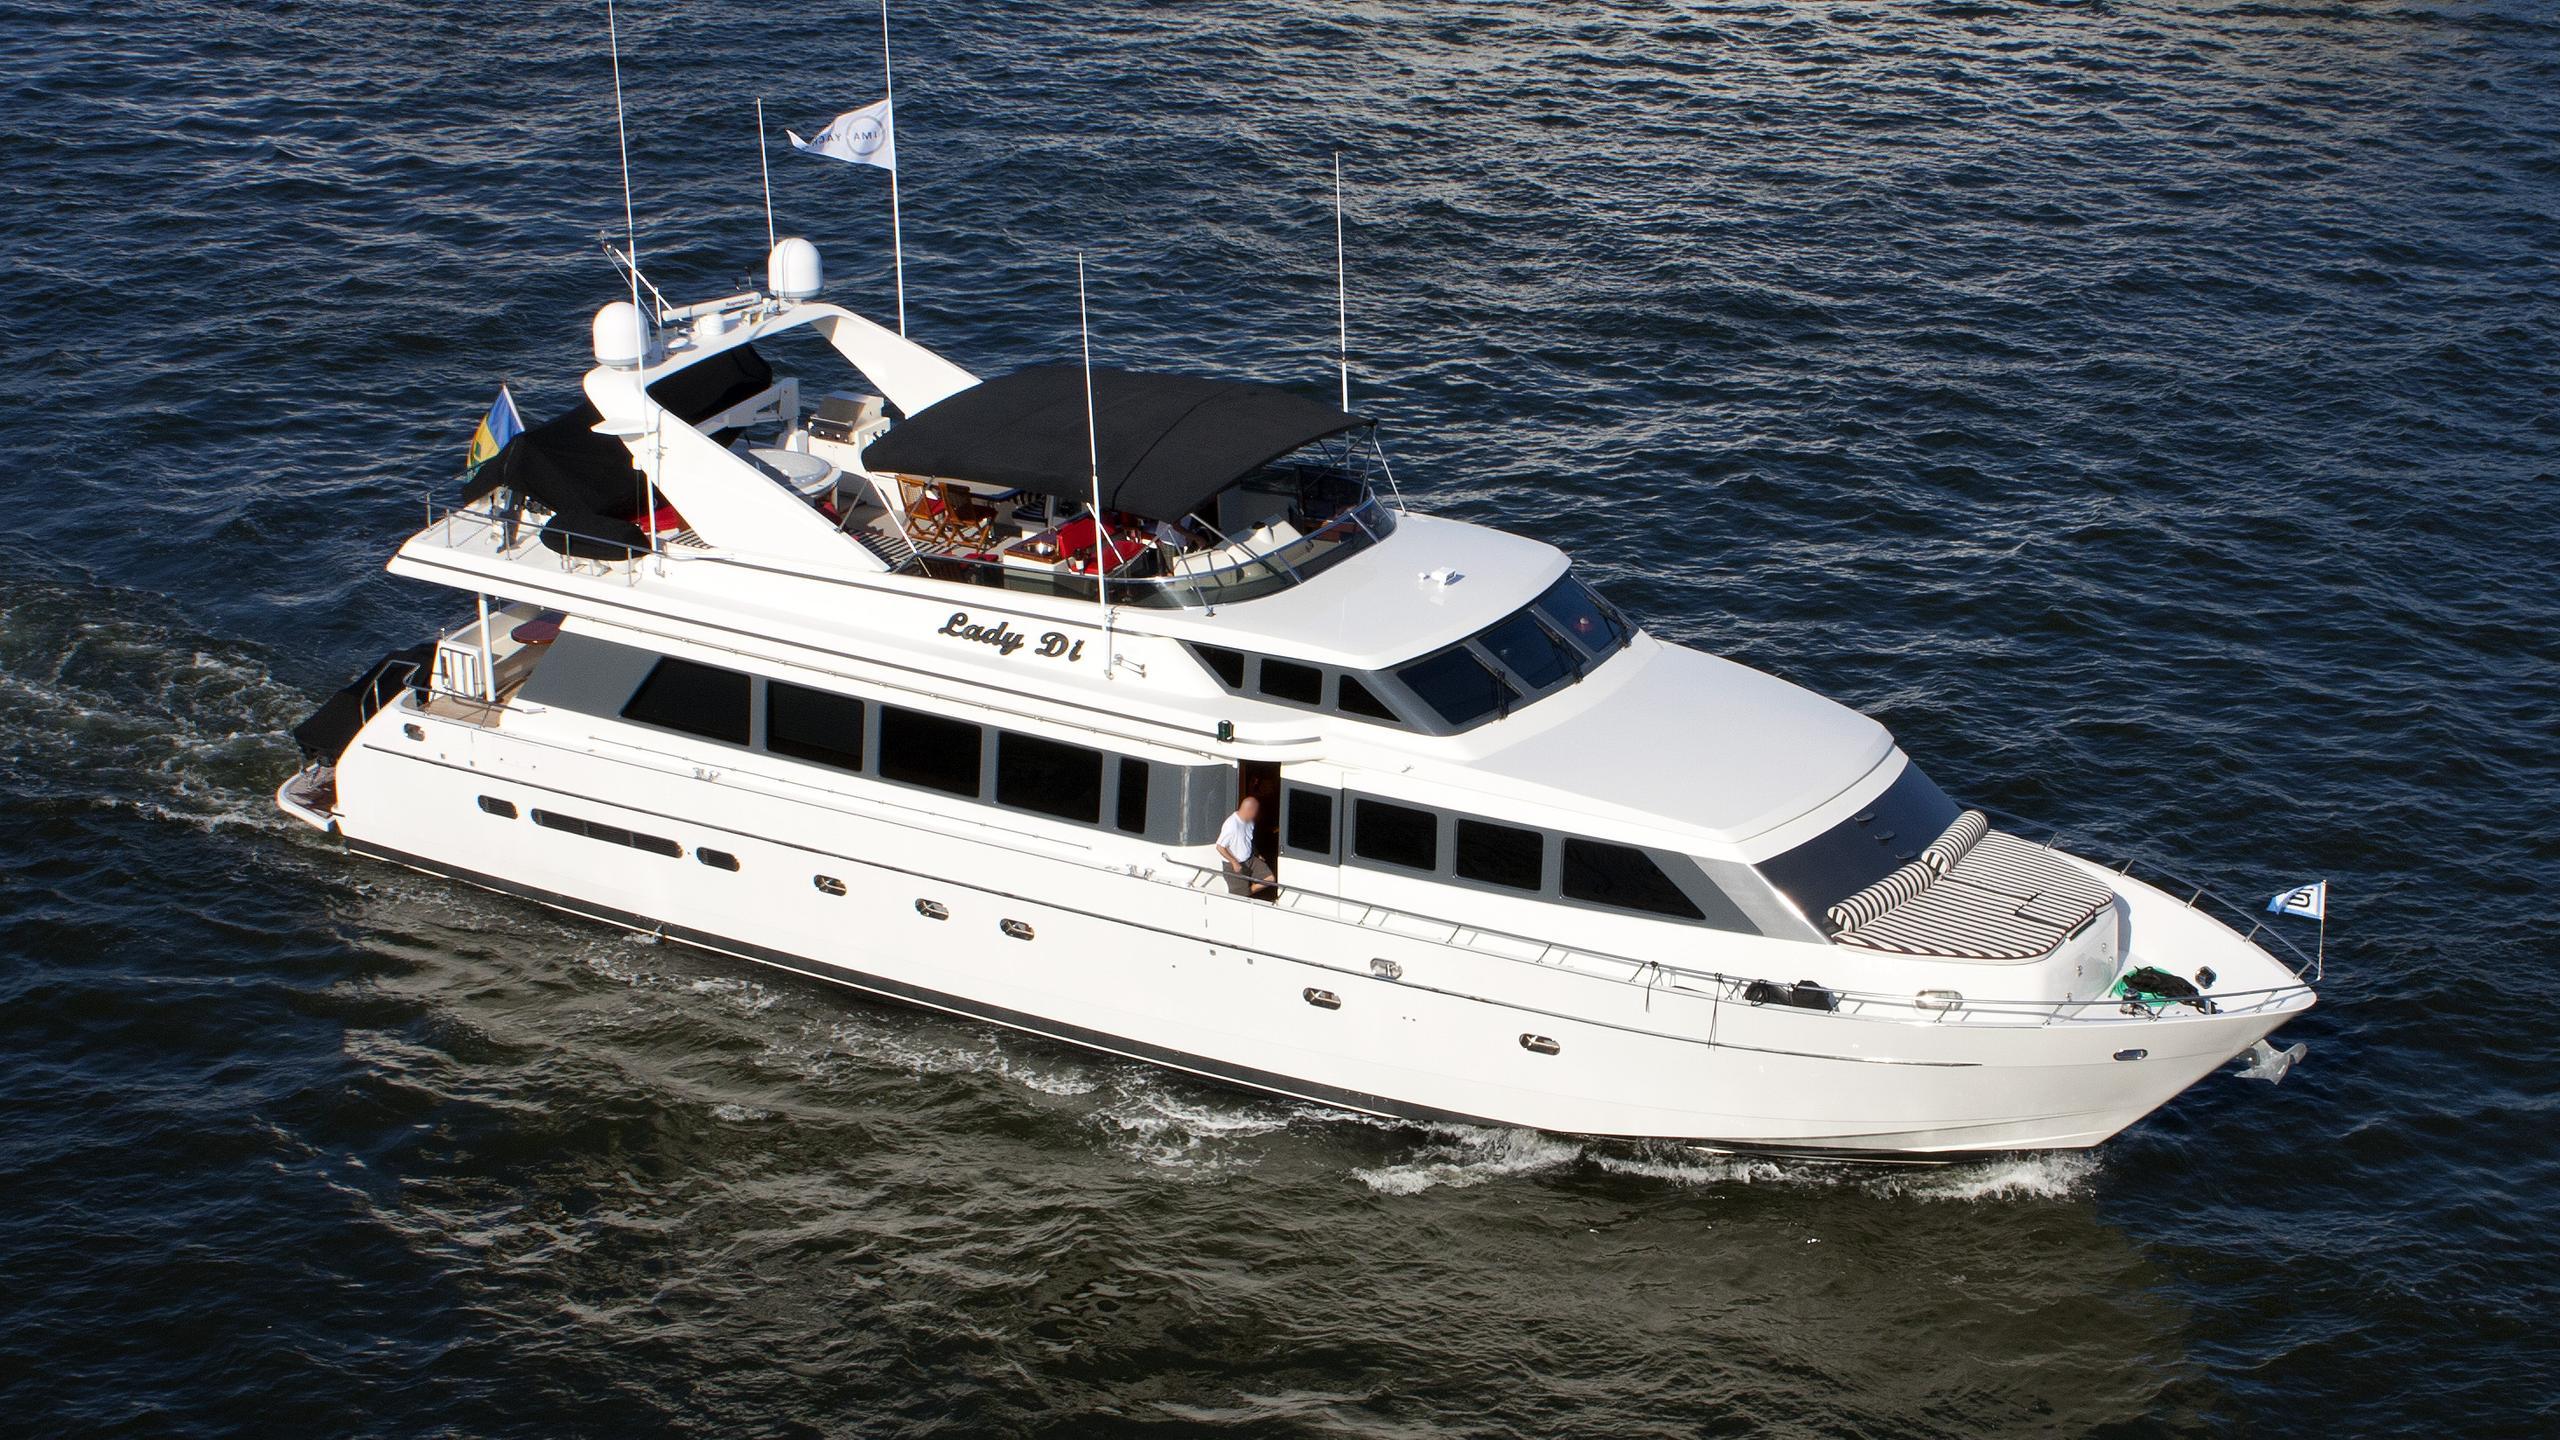 lady-di-motor-yacht-kse-monte-fino-84-rph-1998-26m-aerial